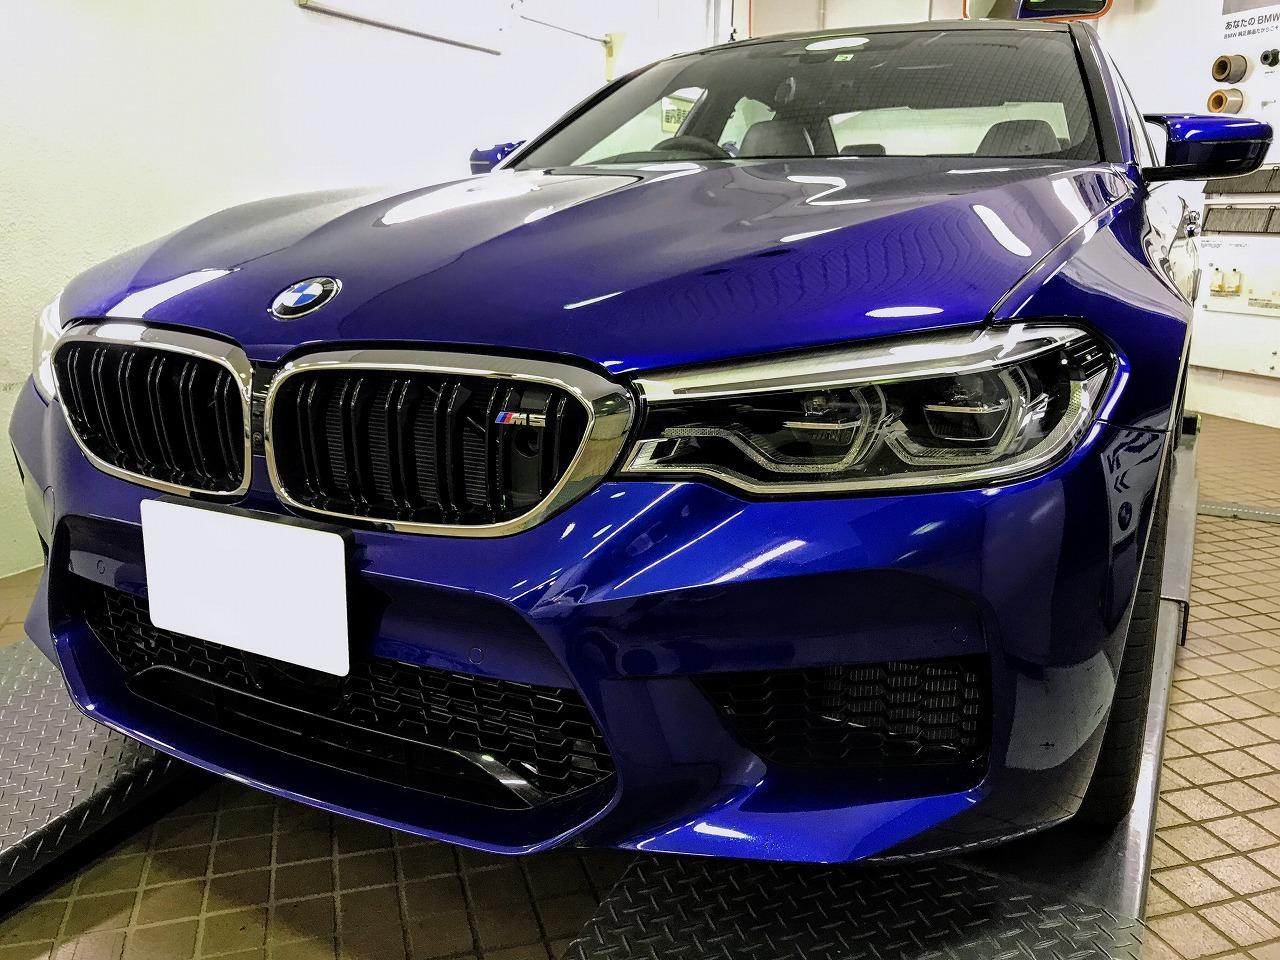 BMW新型M5が2018ワールドパフォーマンスカーを受賞!歴代受賞車やノミネートモデルは?